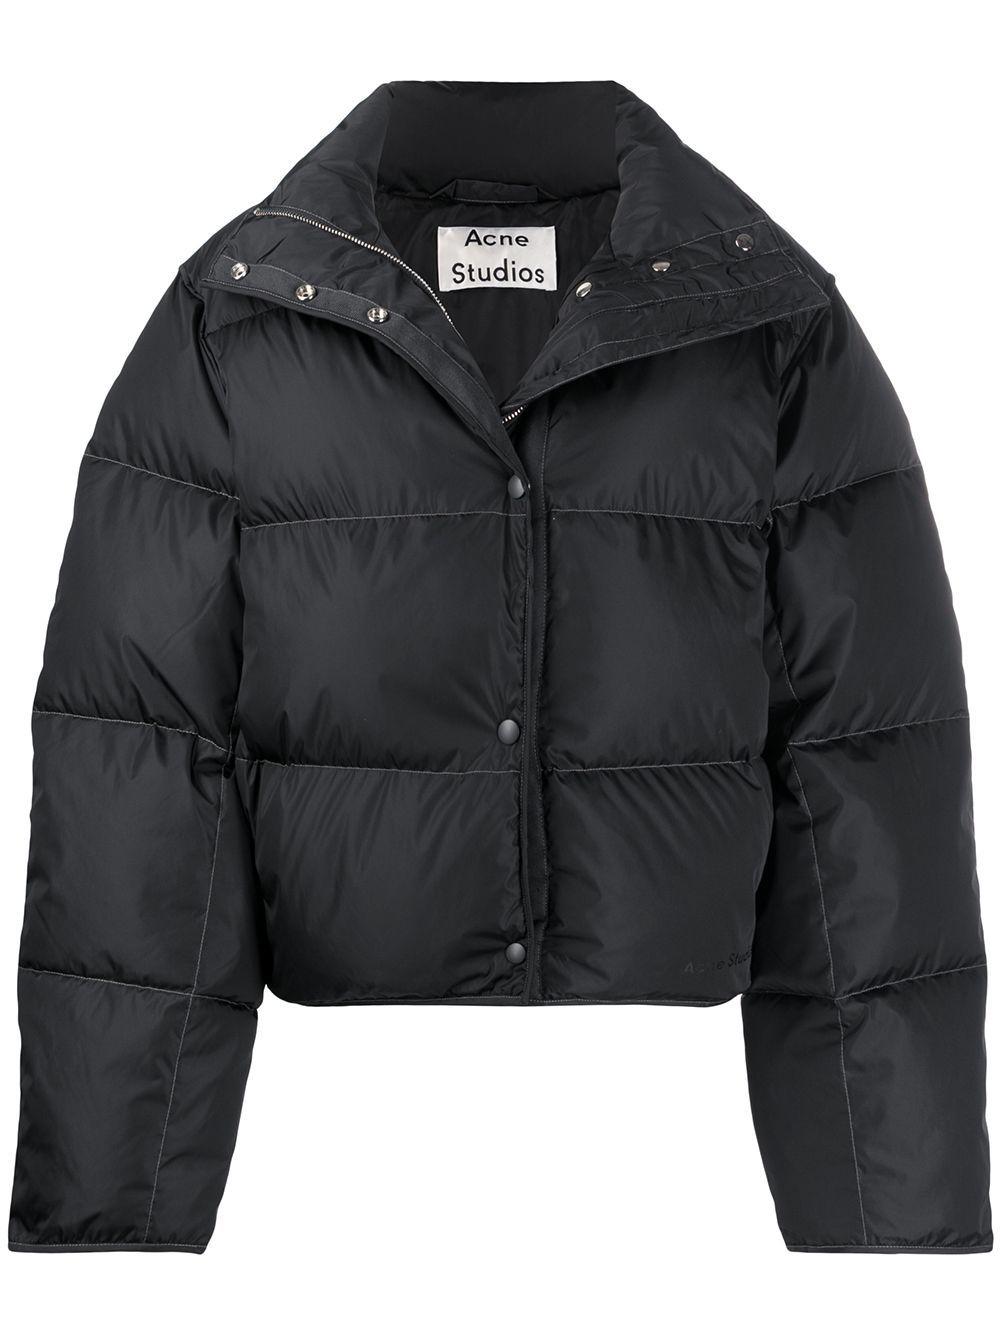 Pin By Jay Cee On Oooo Short Puffer Jacket Puffer Jacket Black Studio Shorts [ 1334 x 1000 Pixel ]